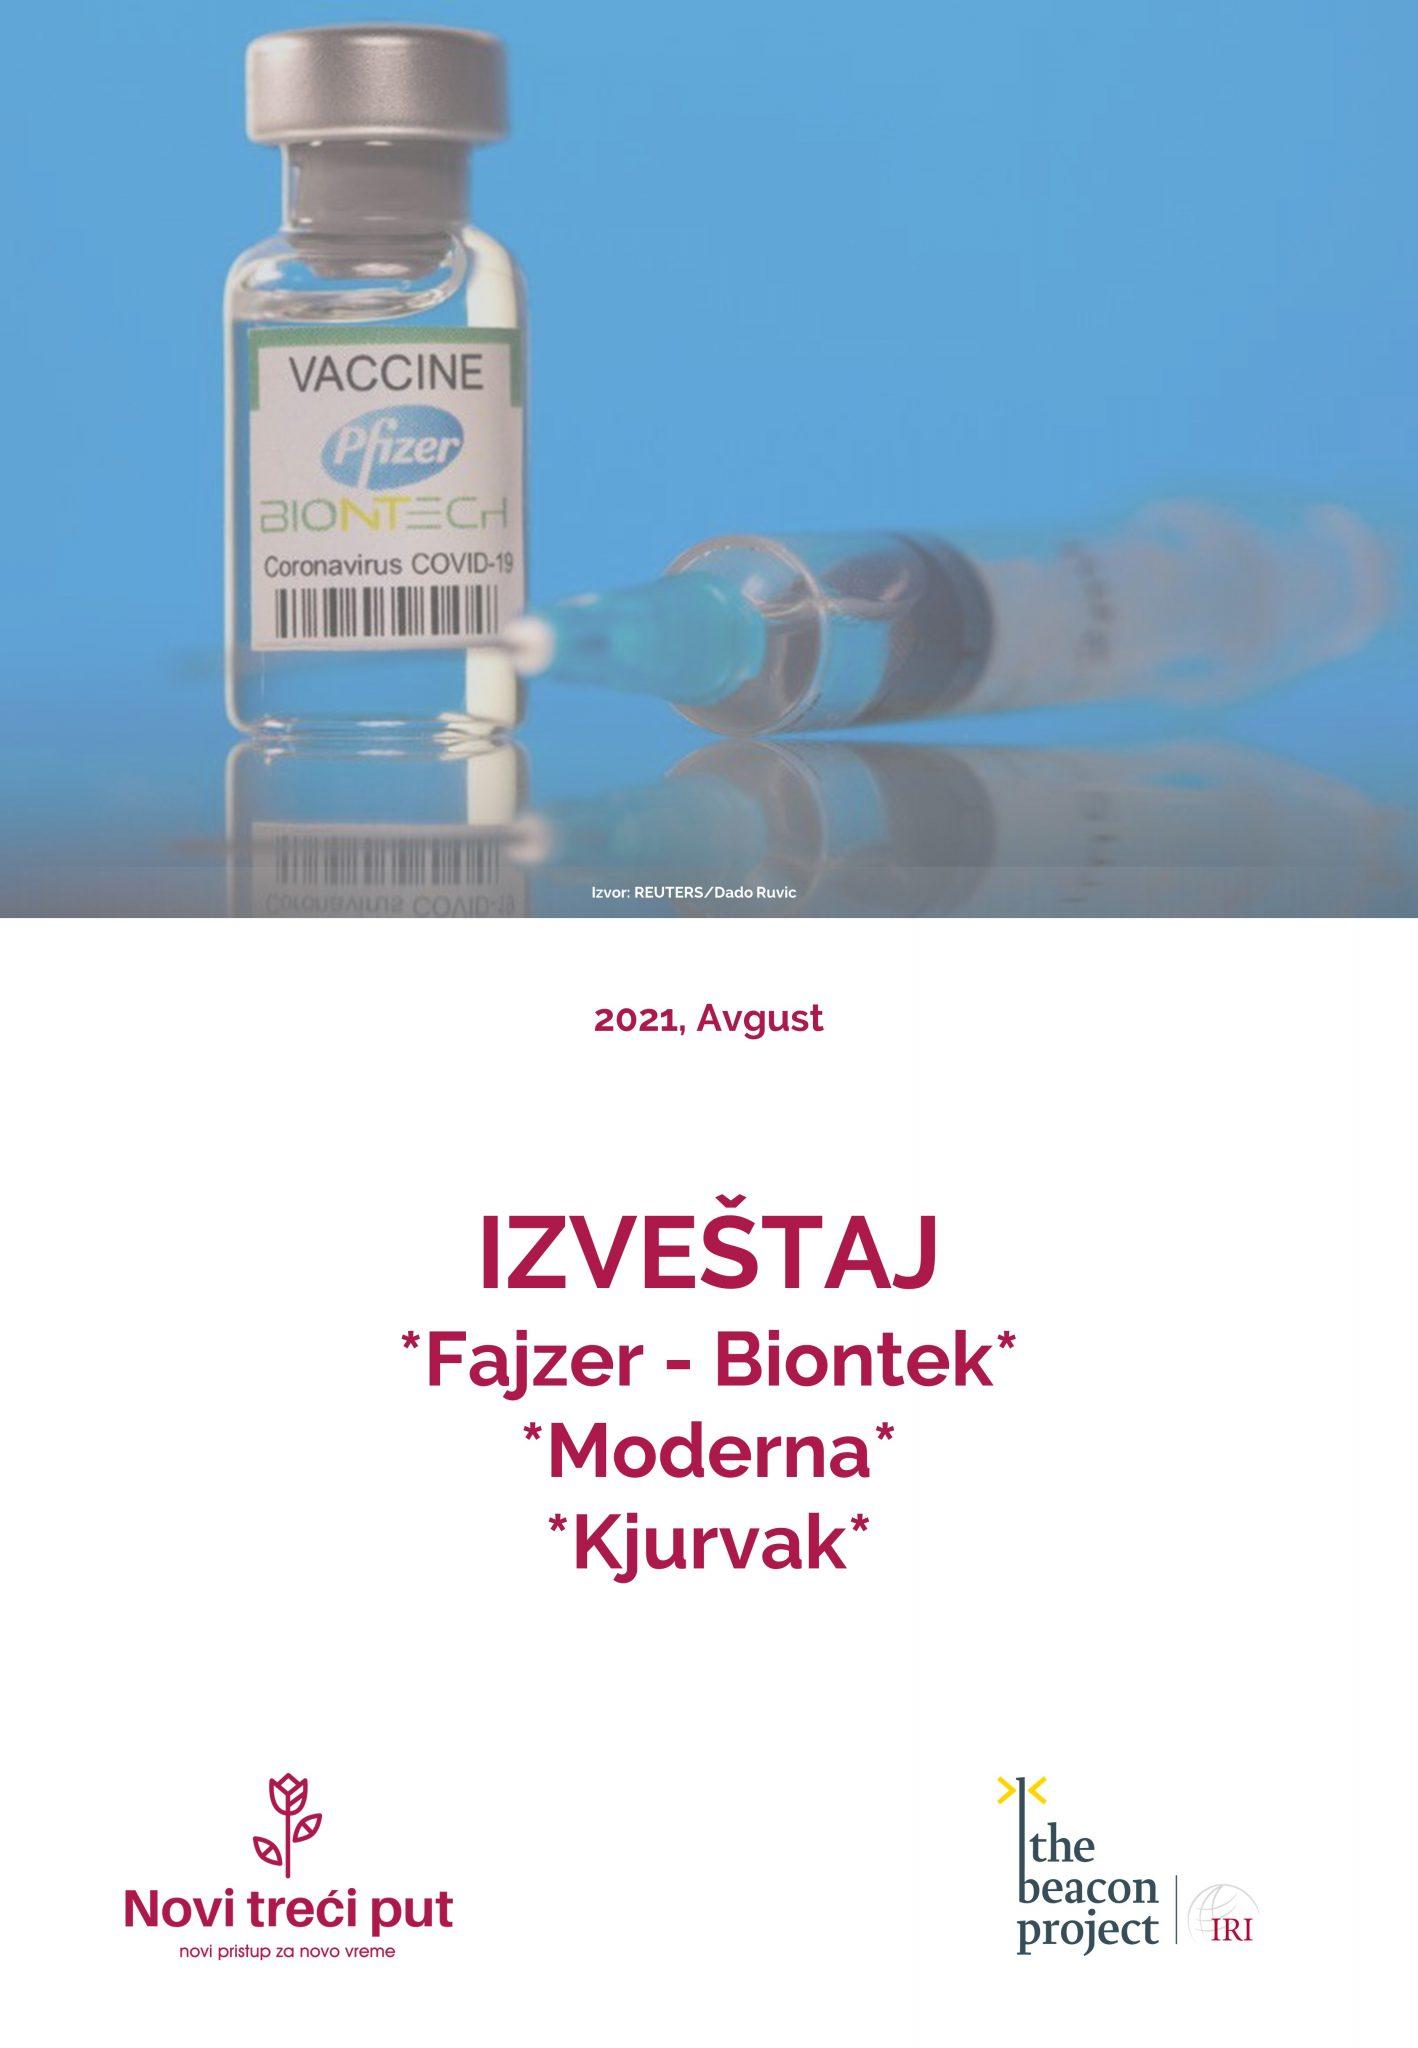 Fajzer-Biontek, Moderna i Kjurvak